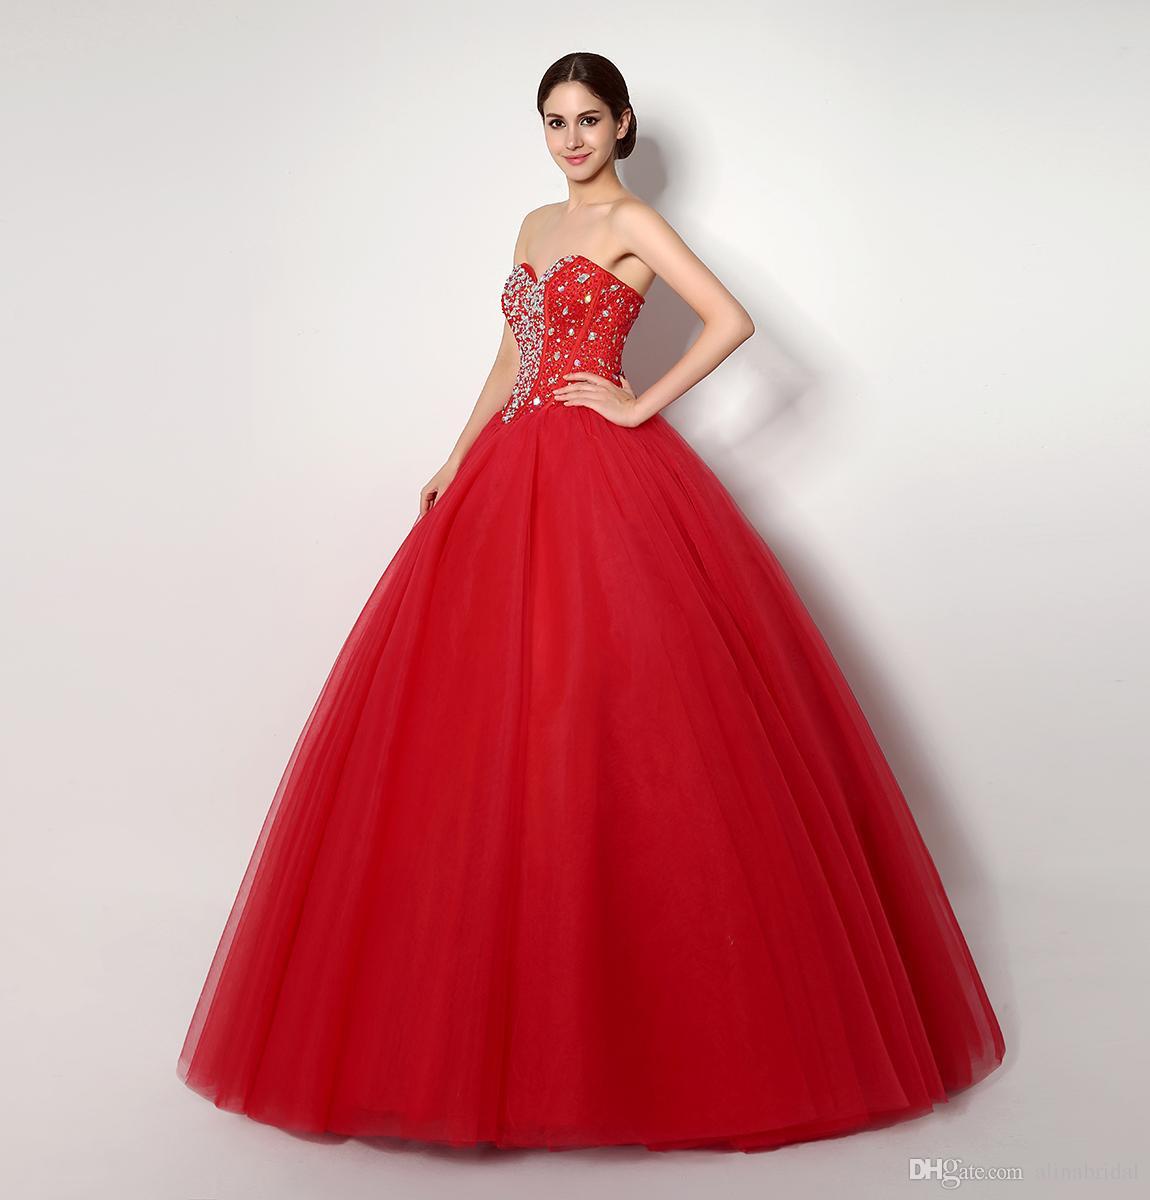 Billiga i lager Red Quinceanera Klänningar 2018 Kristaller Sweetheart Ball Gowns Sweet 16 Dress Tulle High Quanlity Vestidos 15 Party Prom-kappor